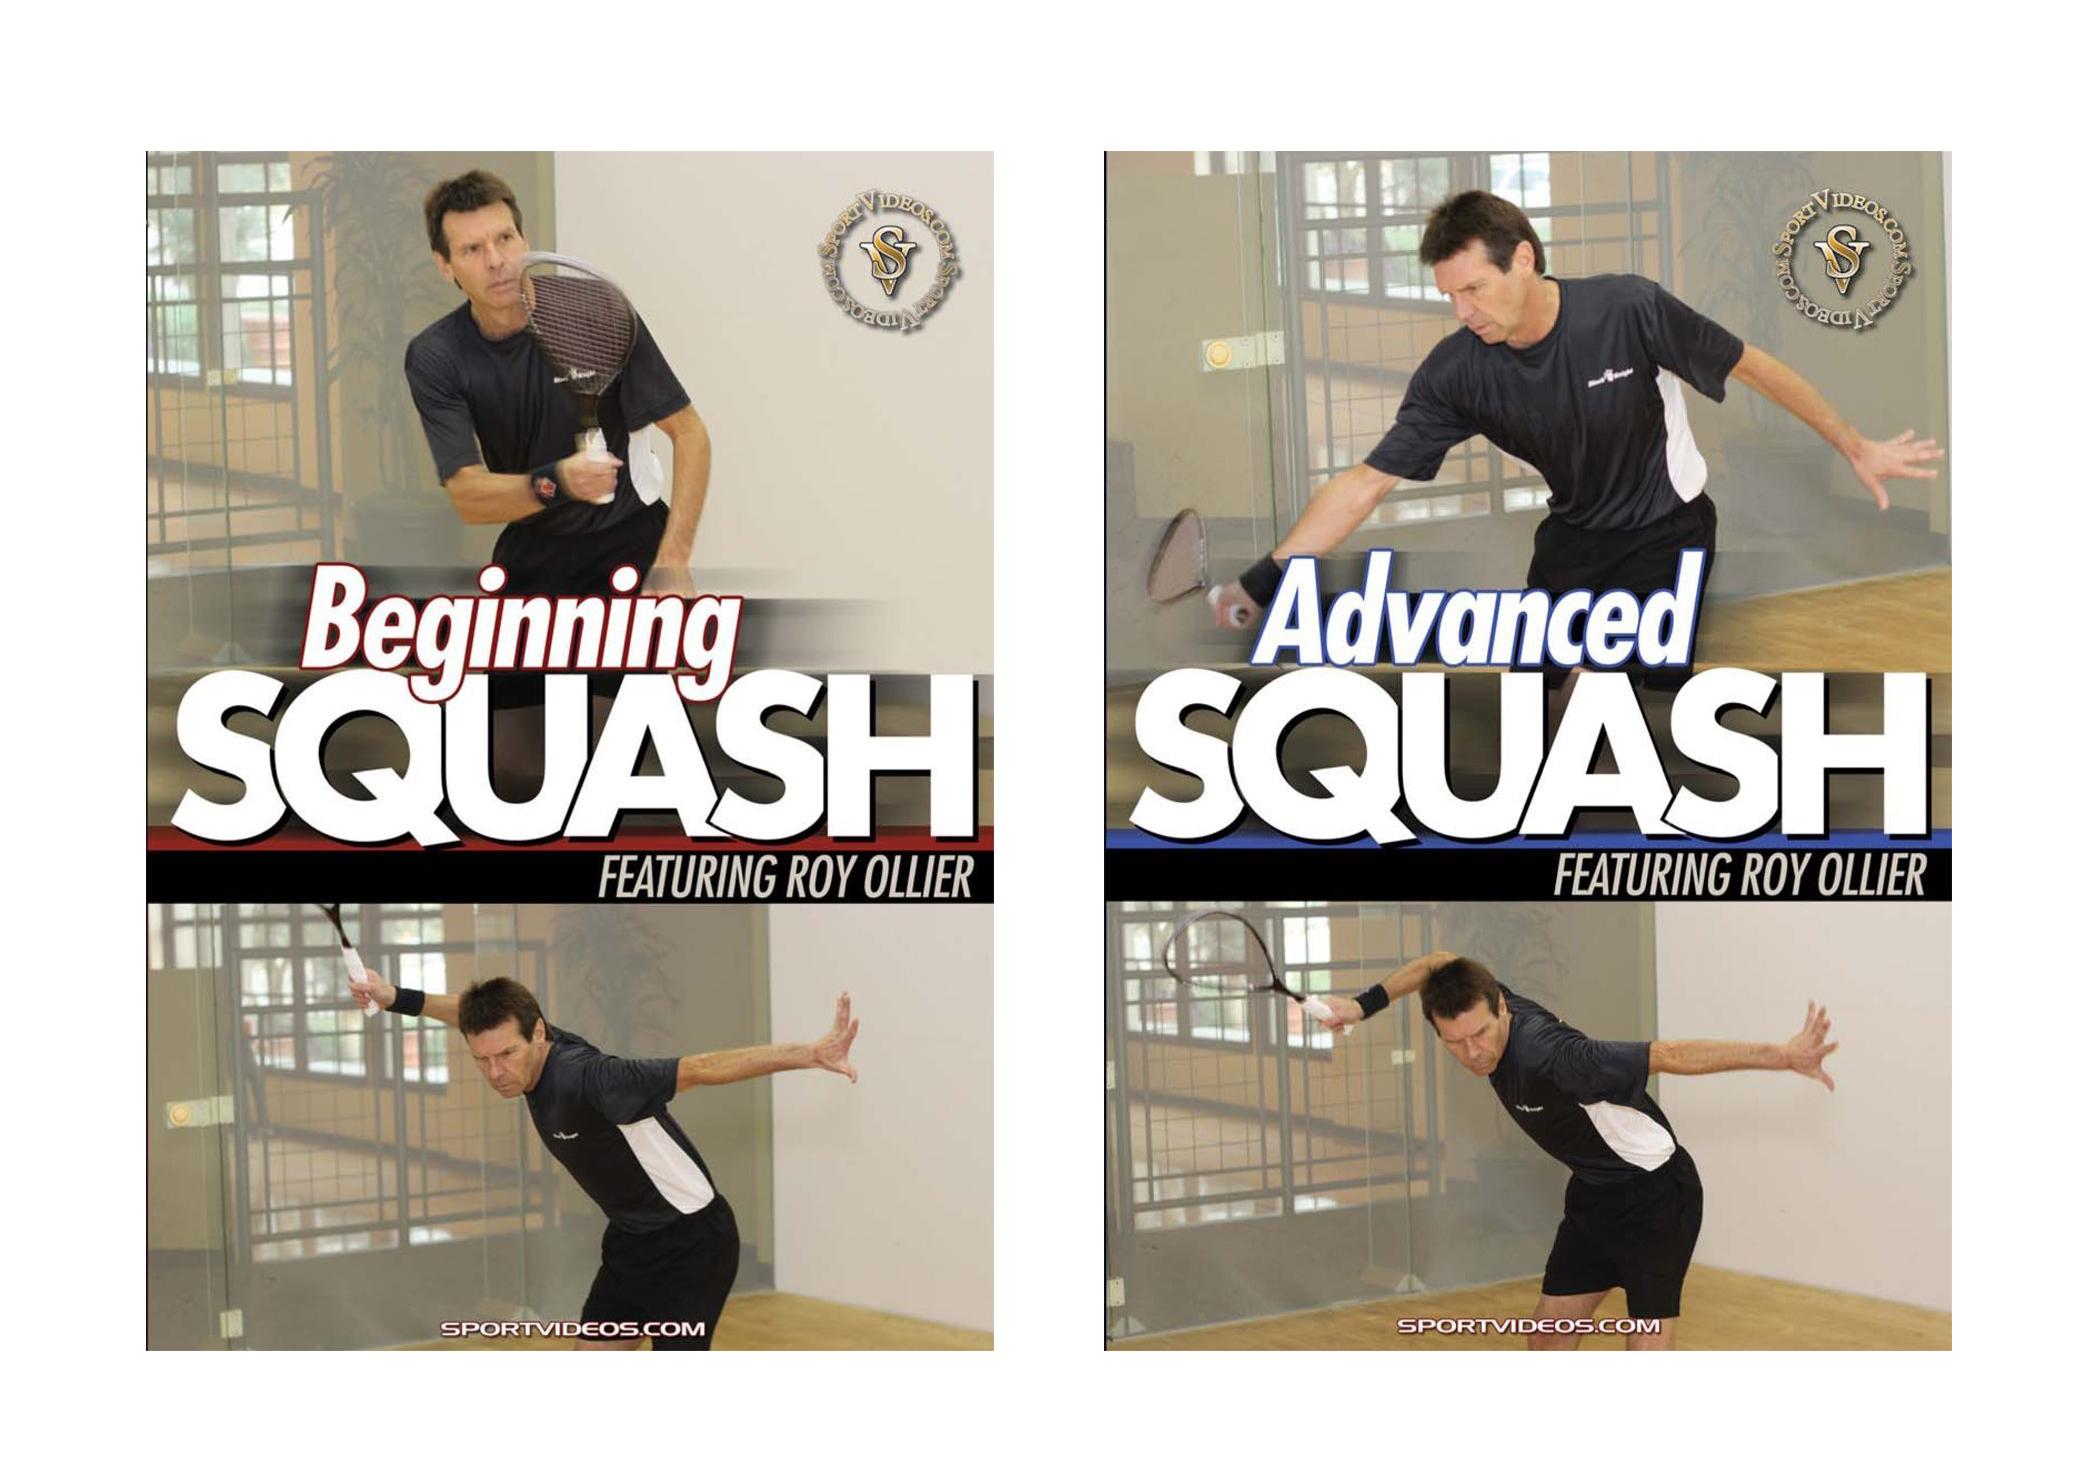 Squash 2 DVD Set or Download - Free Shipping